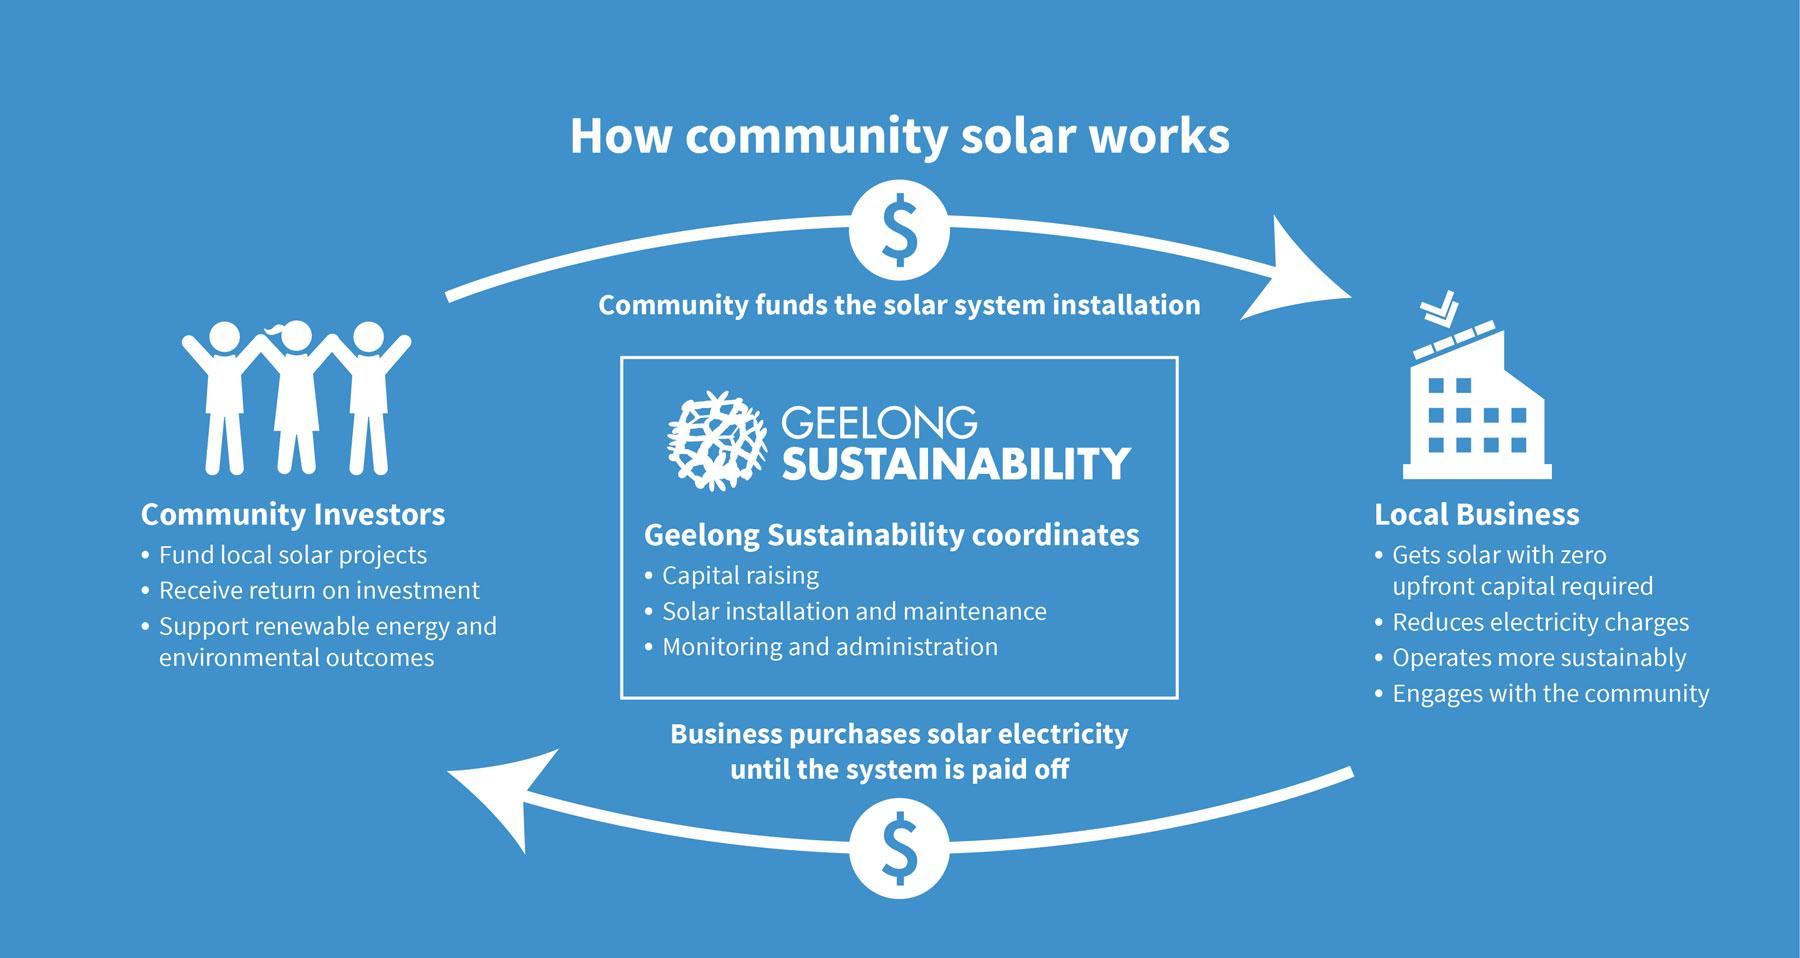 How-Community-Solar-Works--Infographic-Blue.jpg